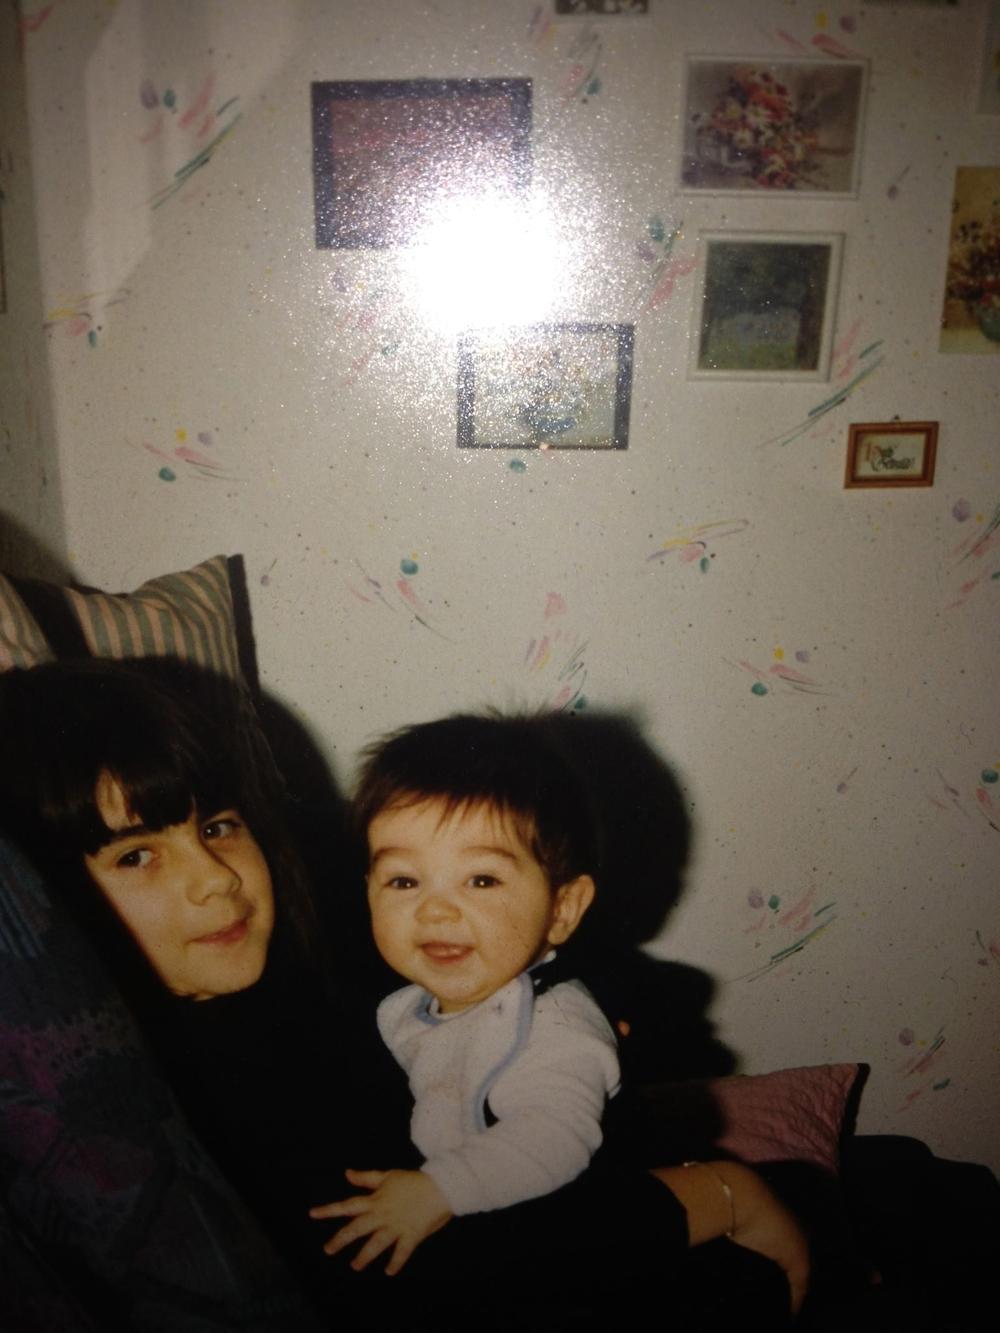 Family photo of my sister and I, Germany circa 1991-92